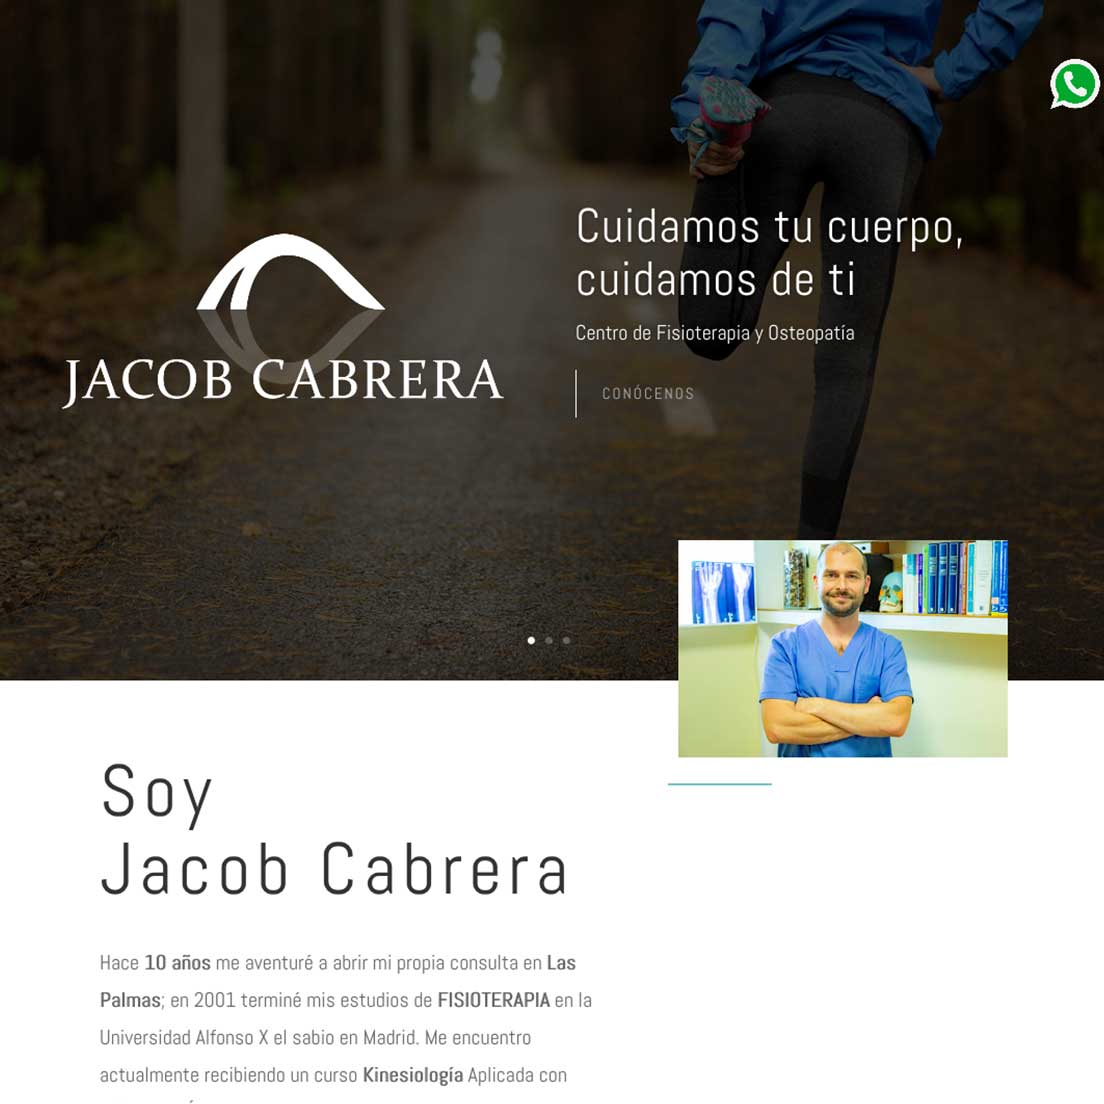 Jacob Cabrera